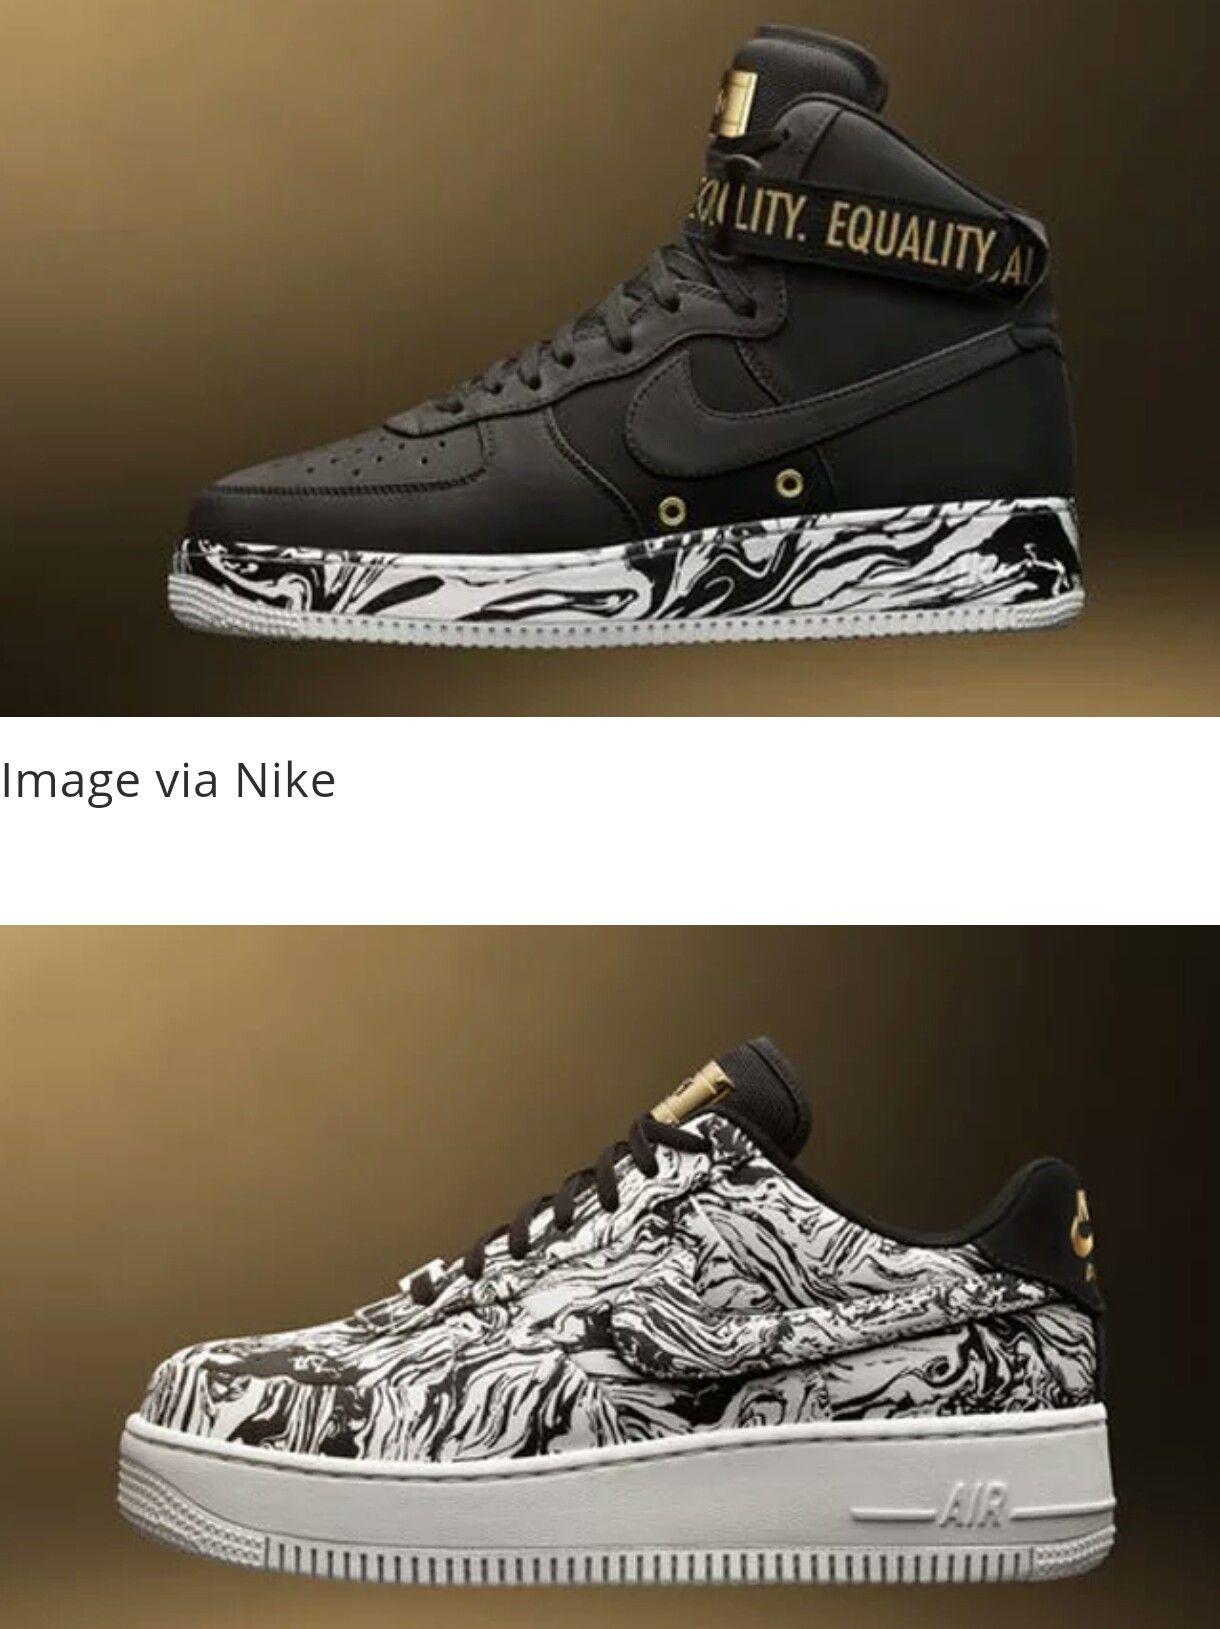 052235f7178c Nike and Jordan Unveil 2017 Black History Month Sneakers